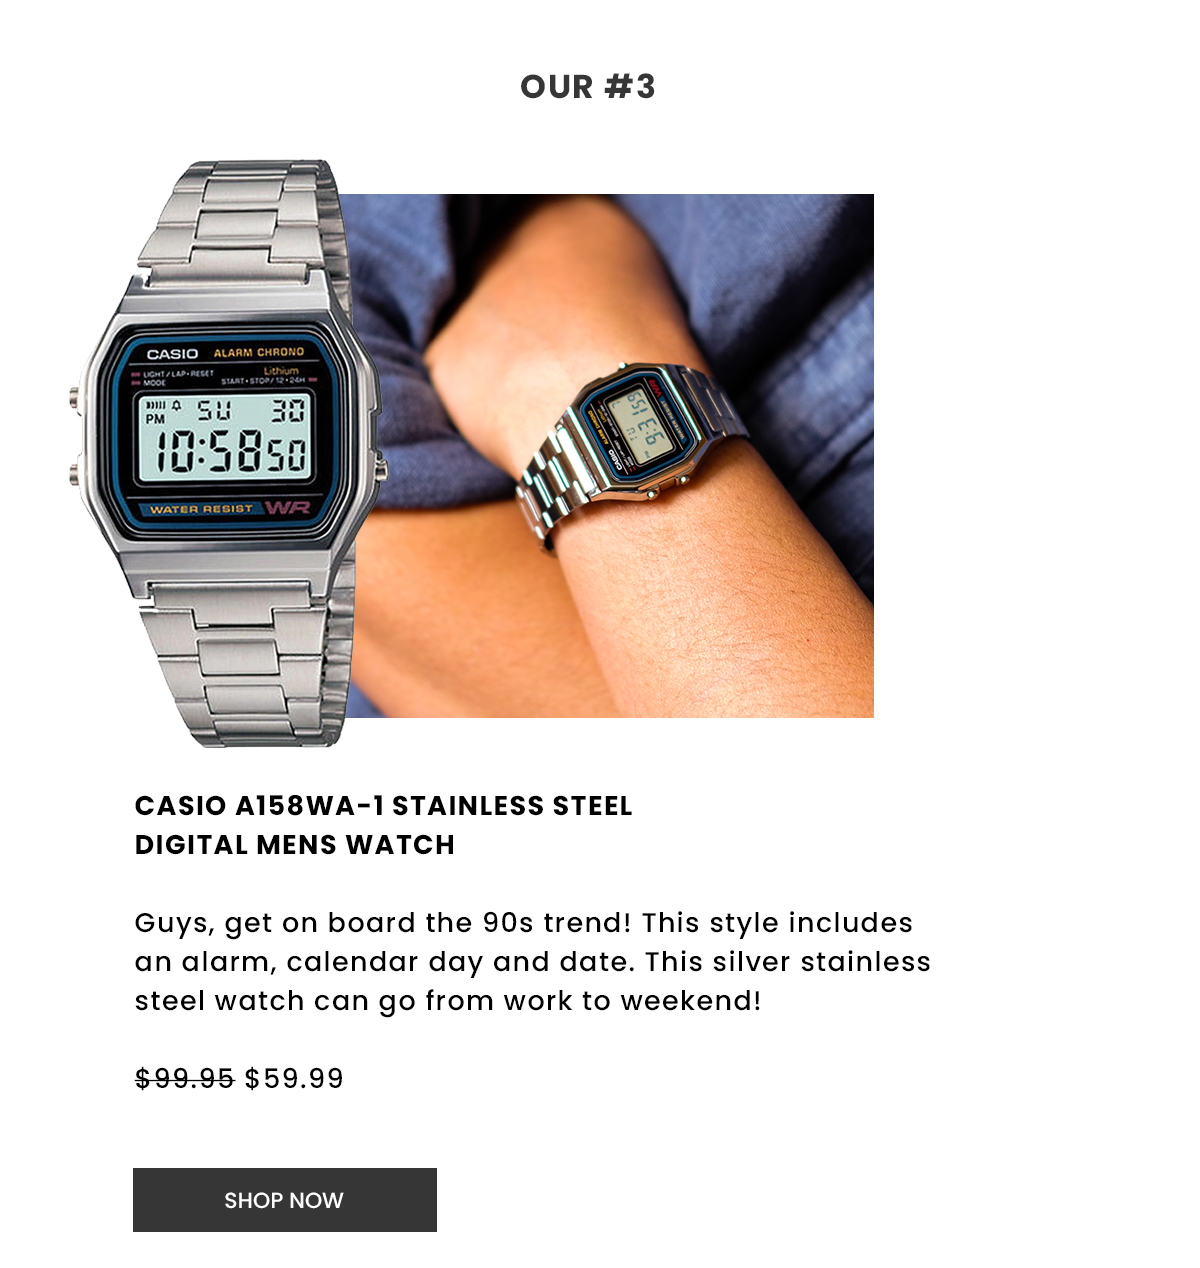 Casio A158Wa-1 Stainless Steel Digital Mens Watch. Shop Now.